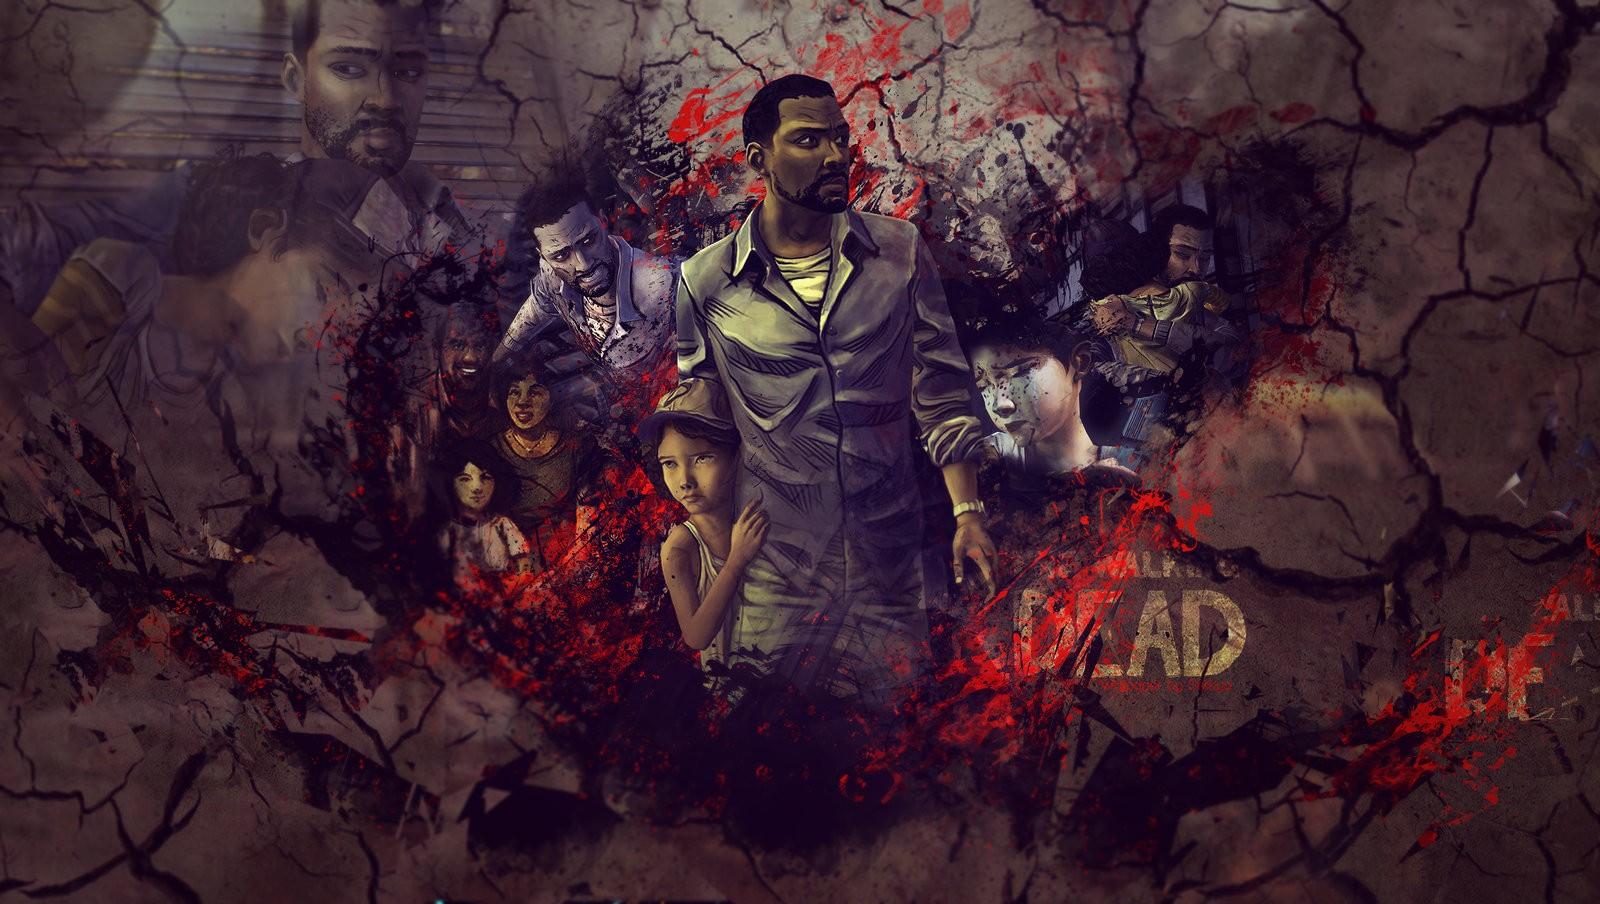 General 1600x904 The Walking Dead Walking Dead: A Telltale Games Series Clementine (Character)